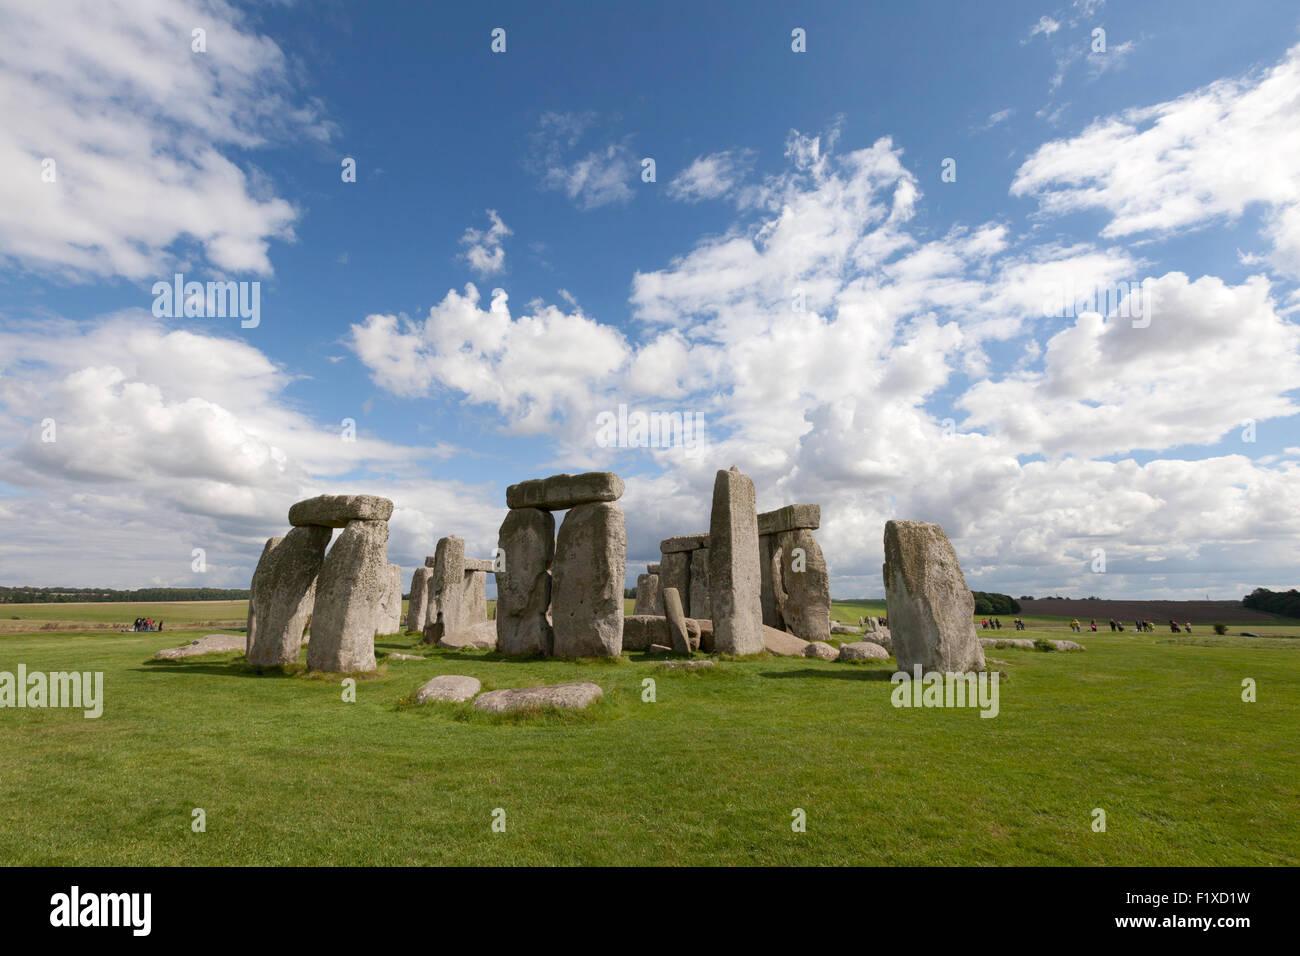 Stonehenge prehistoric neolithic monument and UNESCO World heritage Site, Wiltshire, England UK - Stock Image